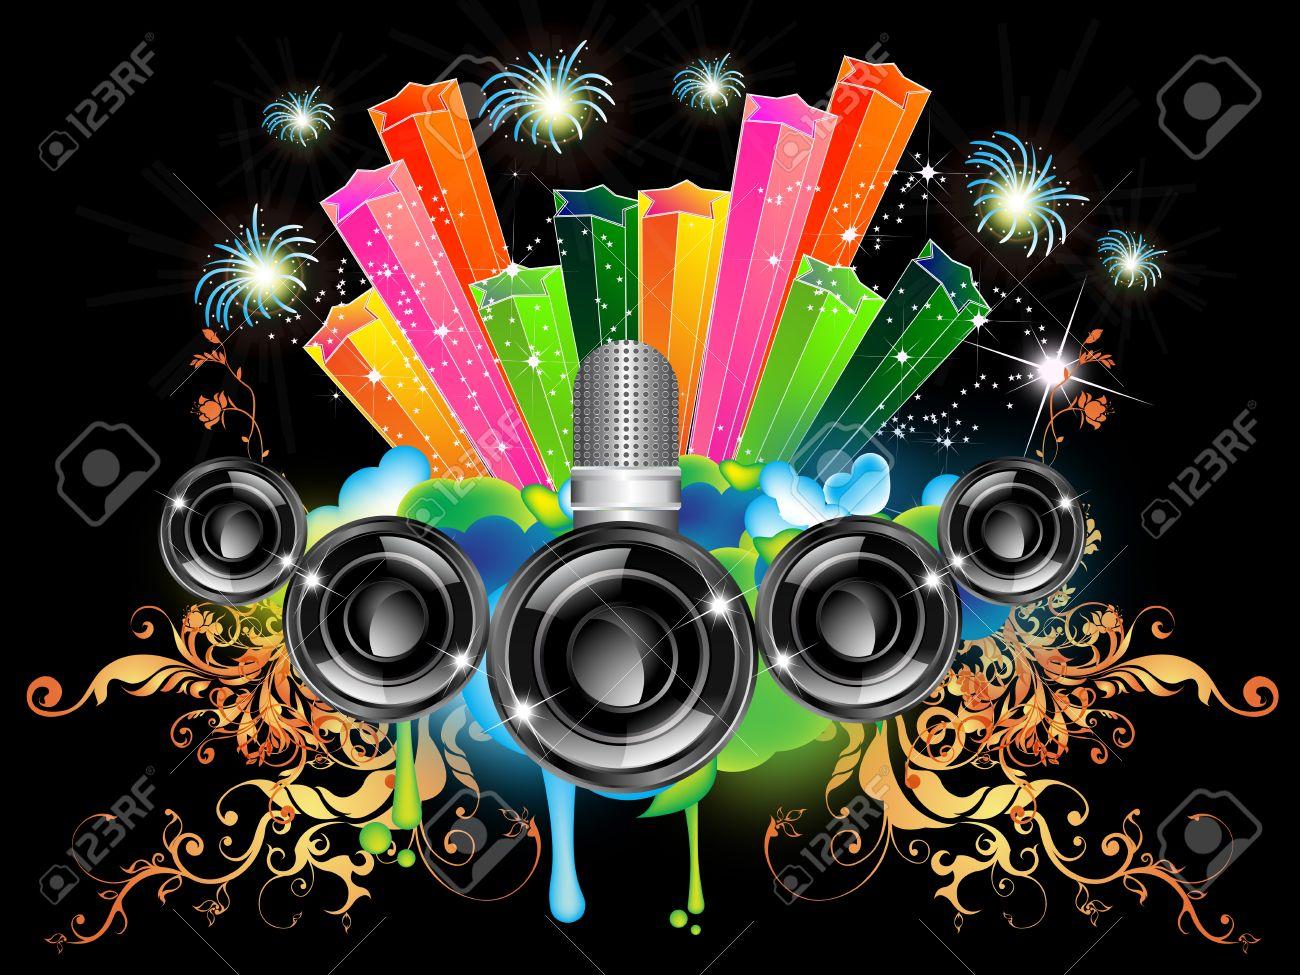 dj sound system wallpaper. dj sound system wallpaper p